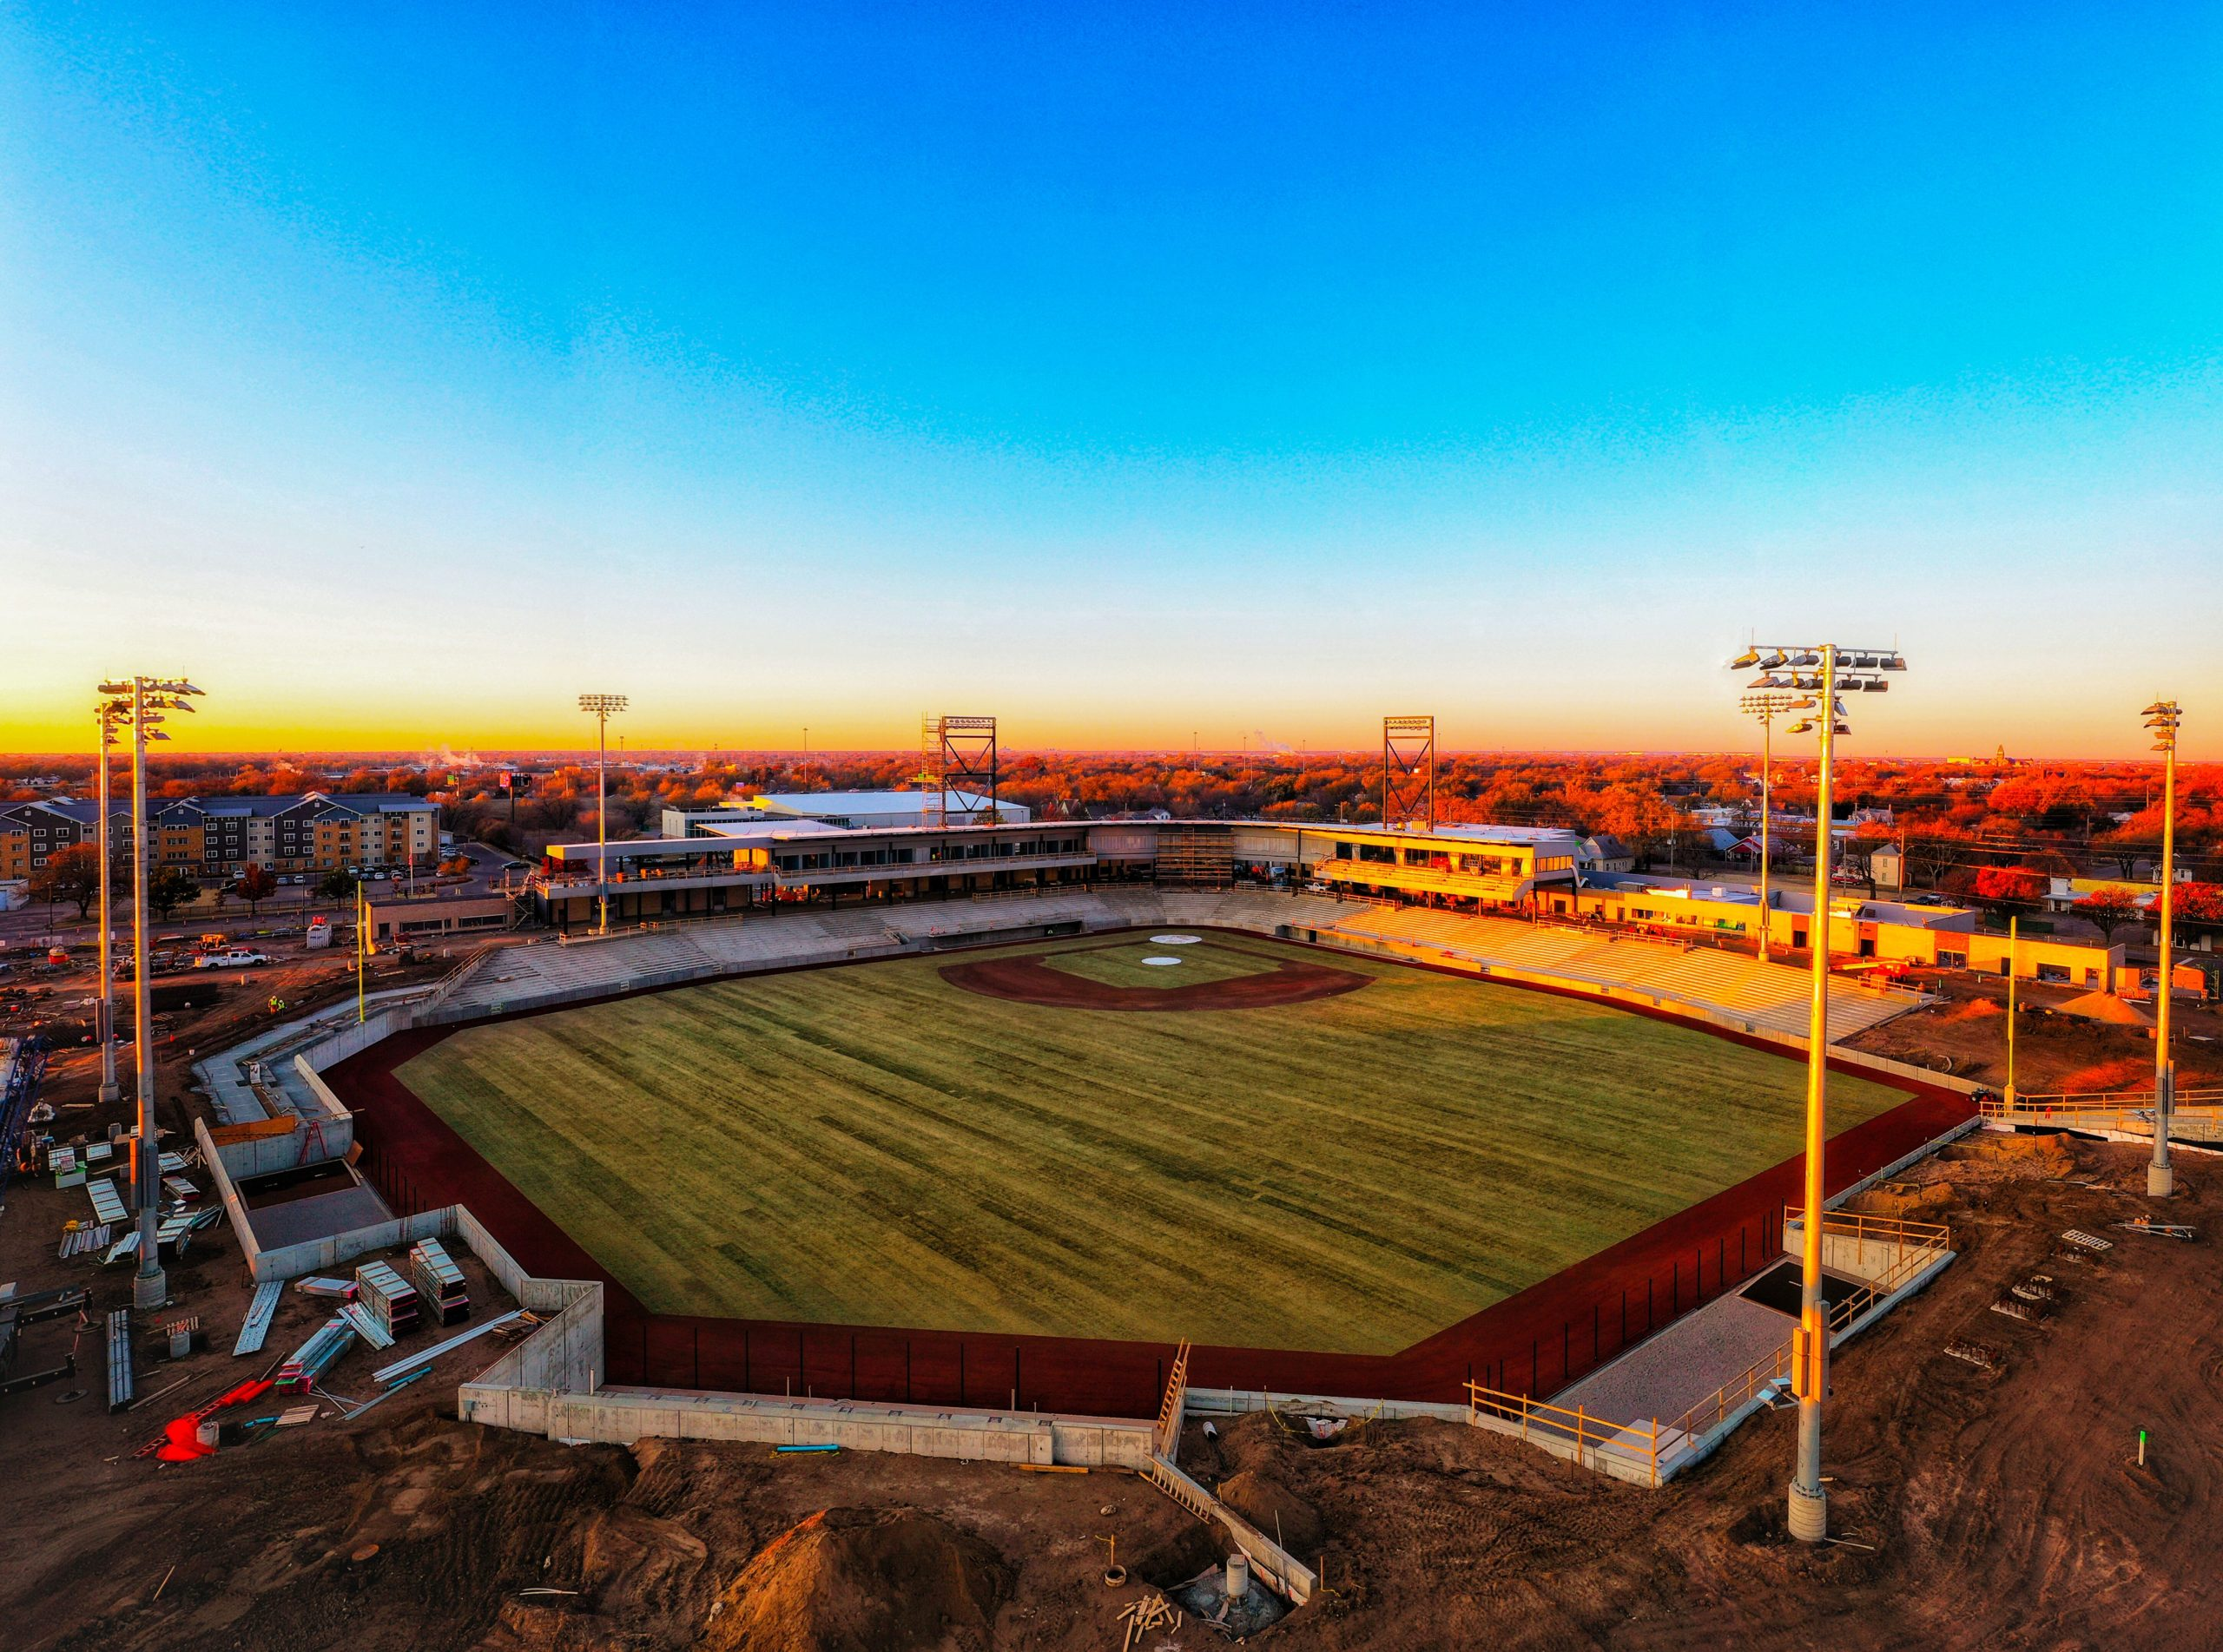 Wichita Baseball Stadium_ credit Drone-Tography LLC